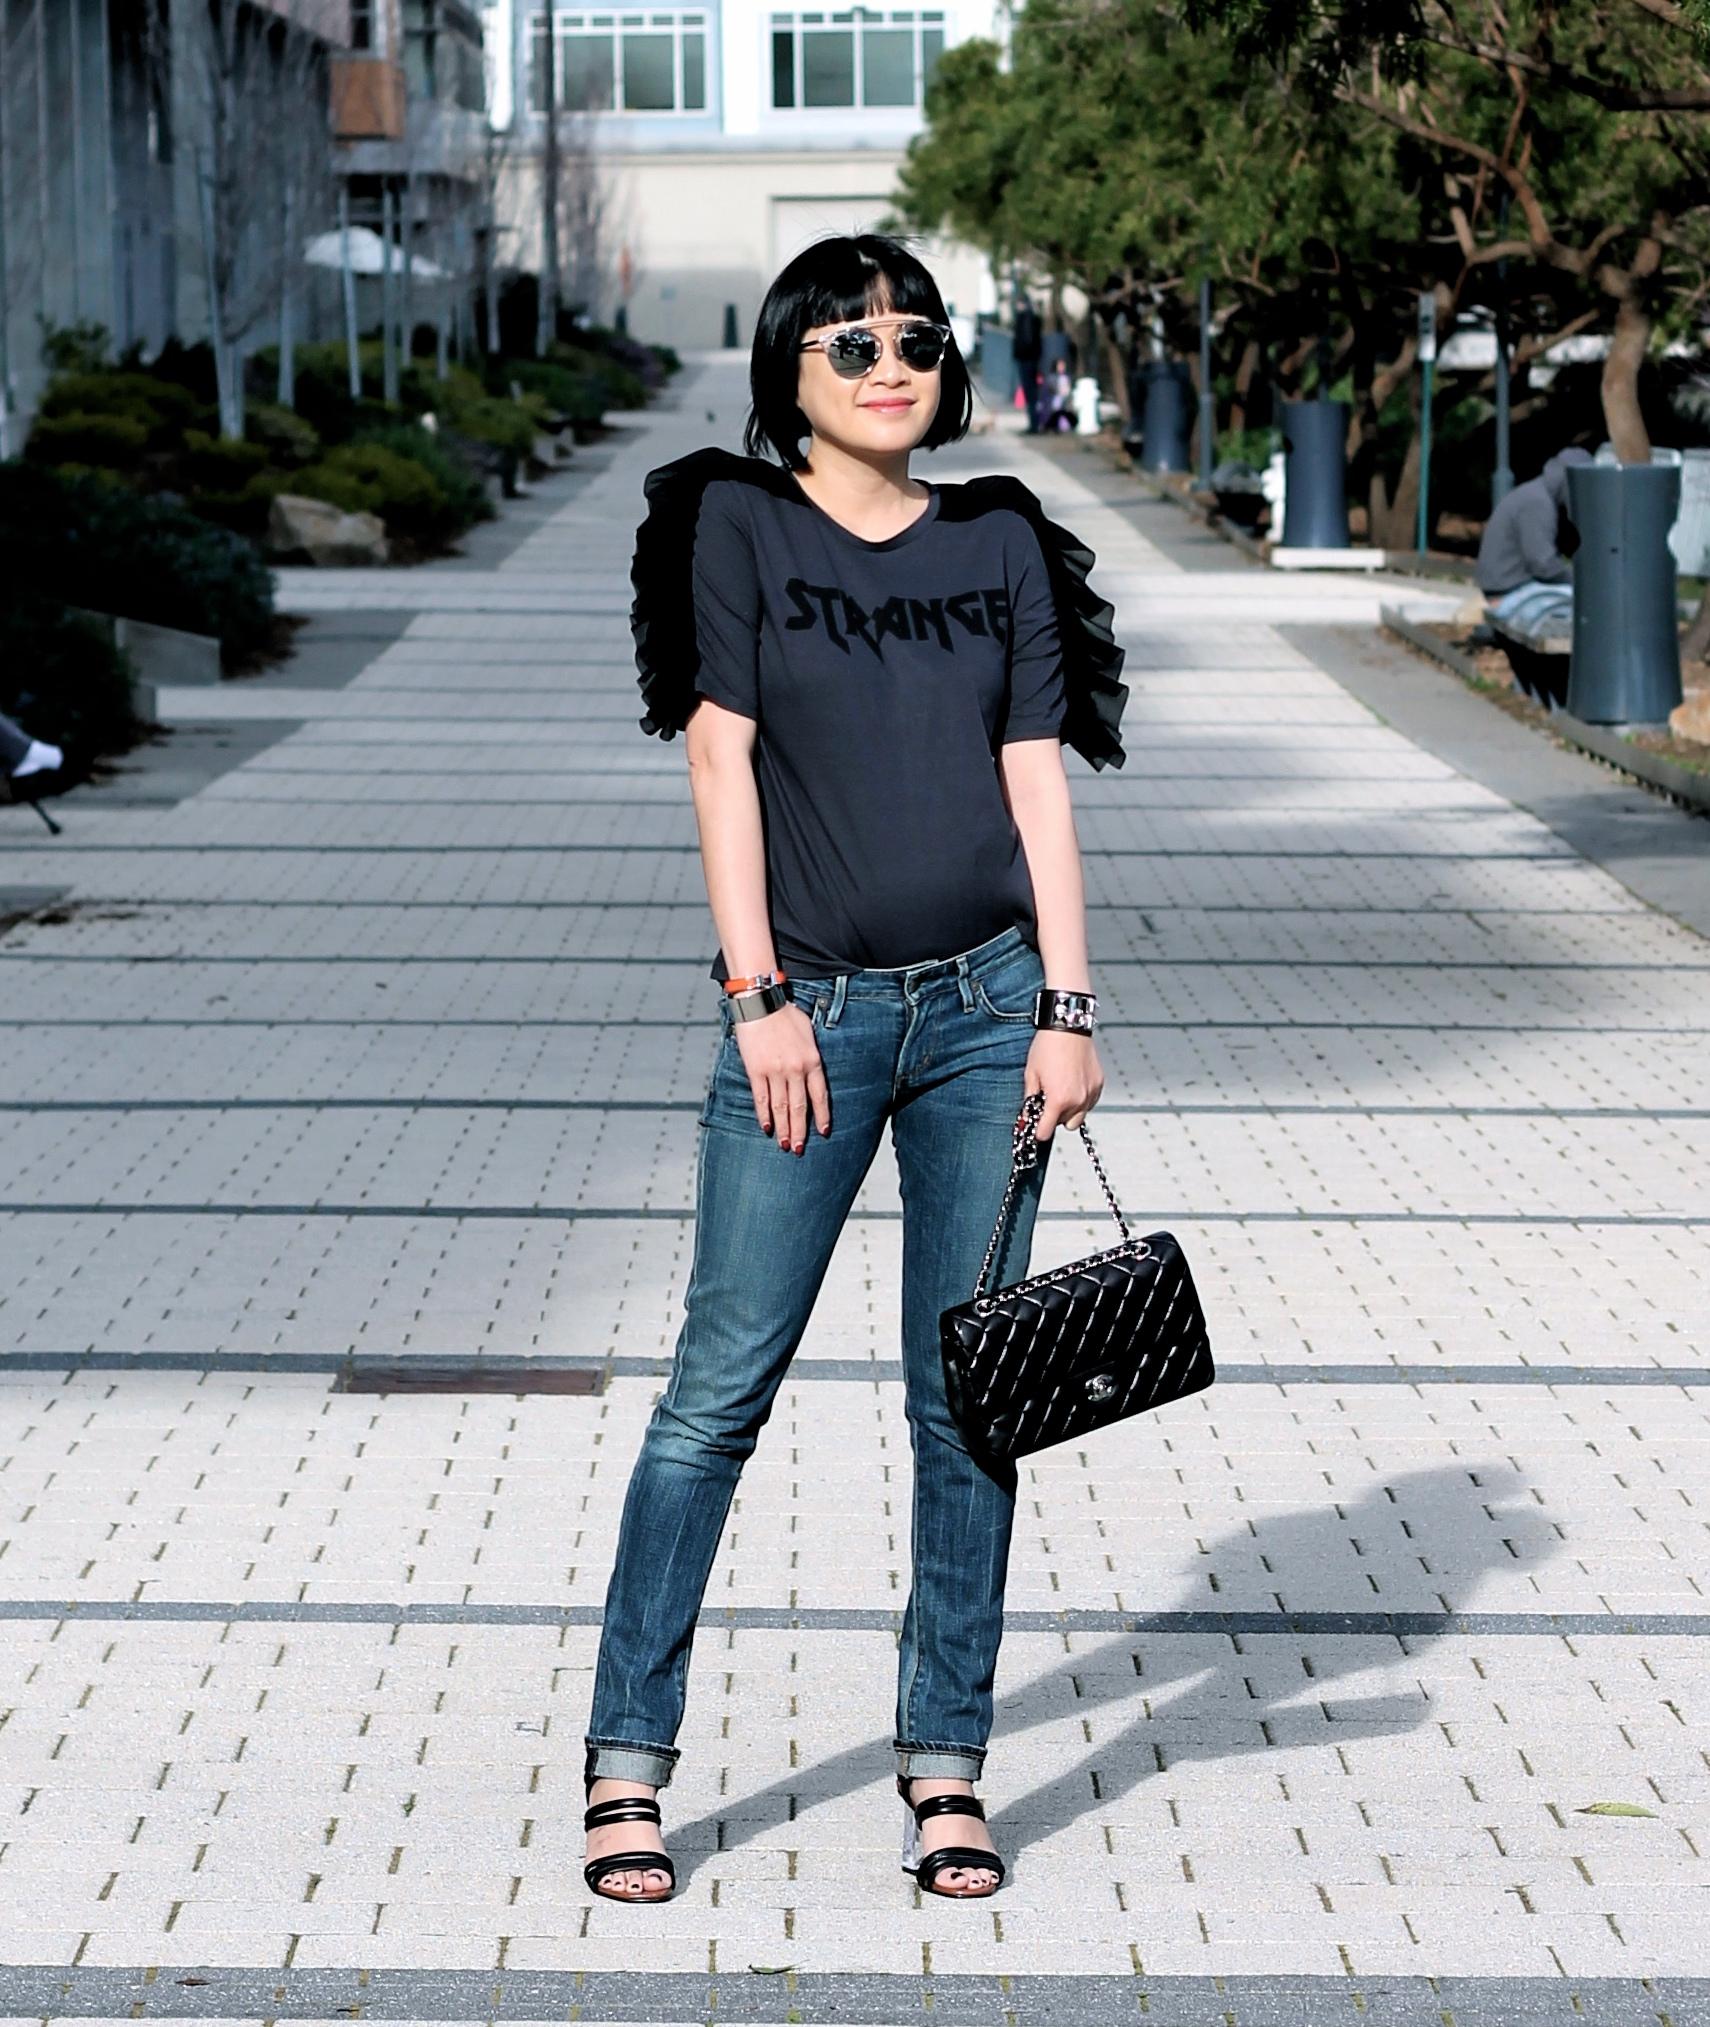 Zara shirt, Citizens of Humanity jeans, Zara sandals, Dior sunglasses, Chanel bag